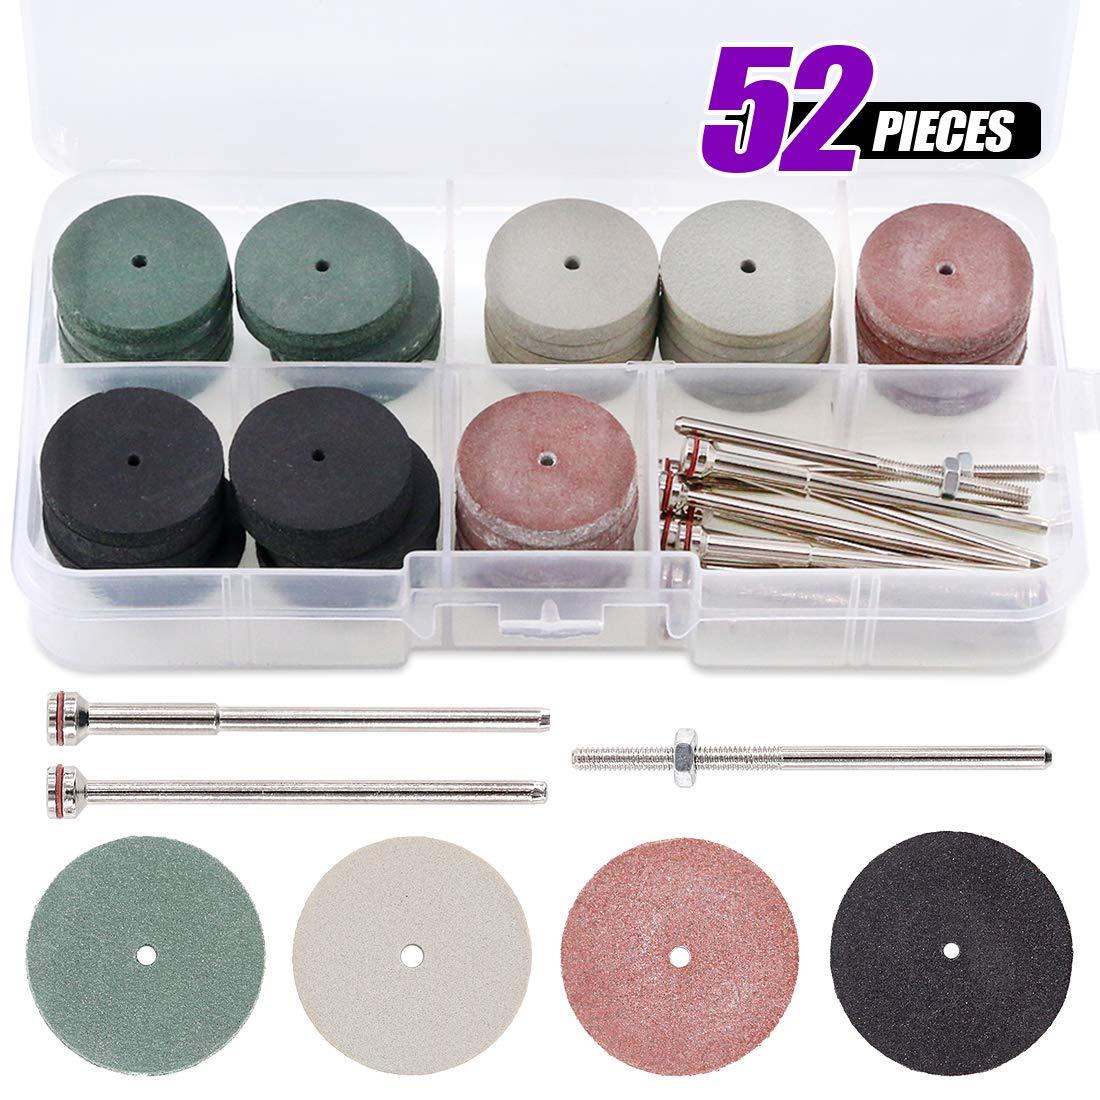 40Pcs 4 Colors Mixed Lab Beauty Silicone Rubber Polishing Wheels Swpeet 52Pcs Polishing Wheels Kit 12 Mandrel Shank Perfect for Rotary Hand Pieces Dremel Rotary Tool